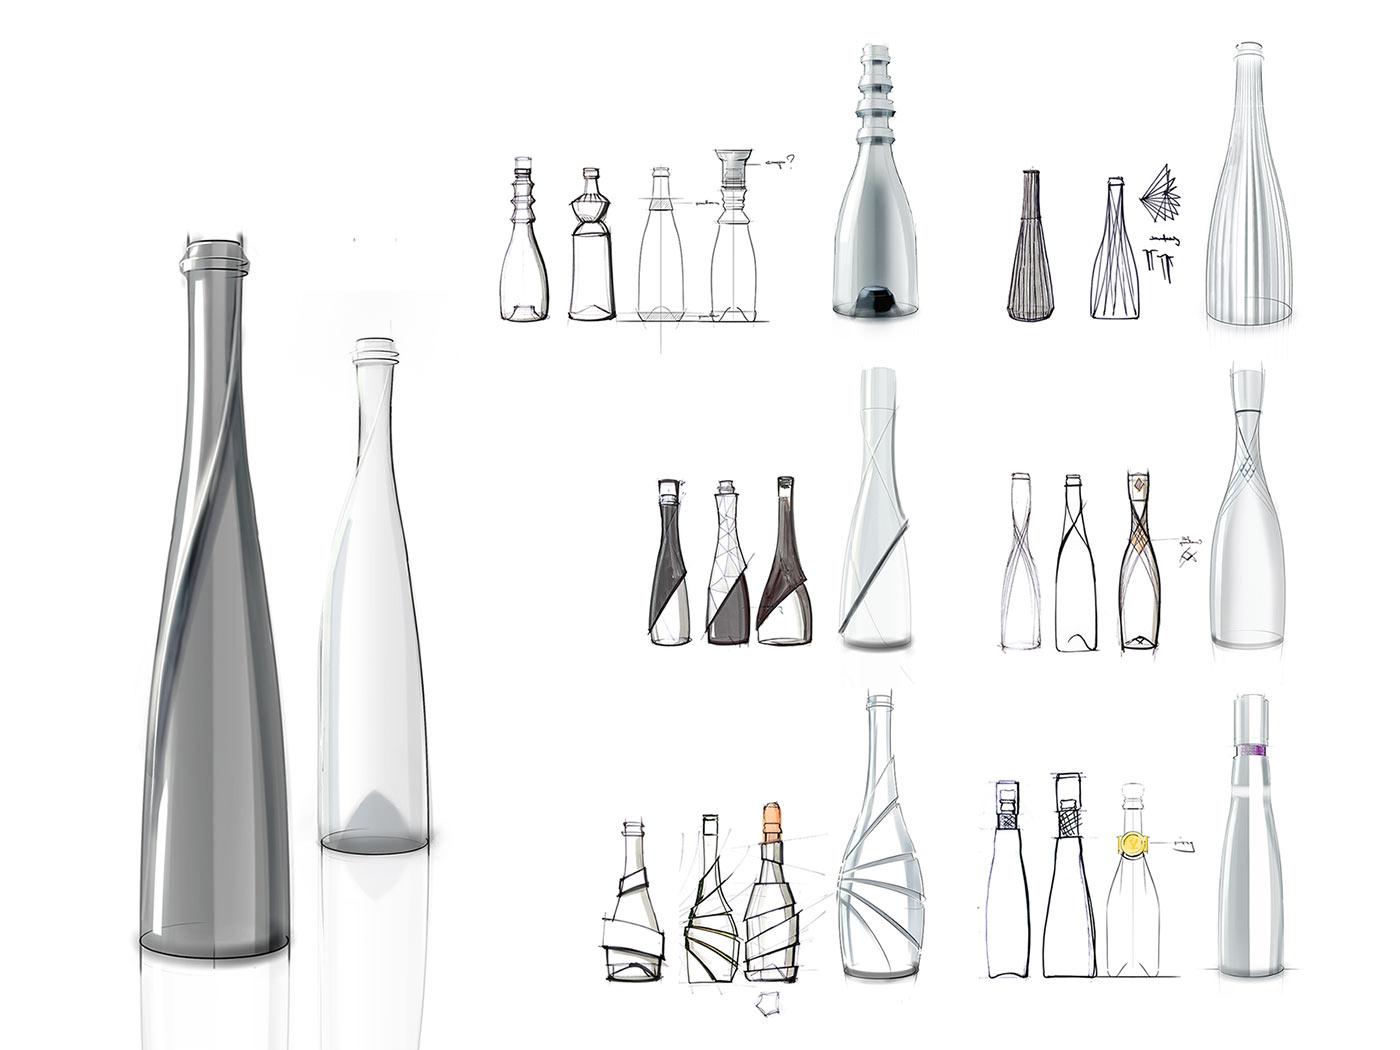 The Sparkling Diva Prosecco Bottle Envary